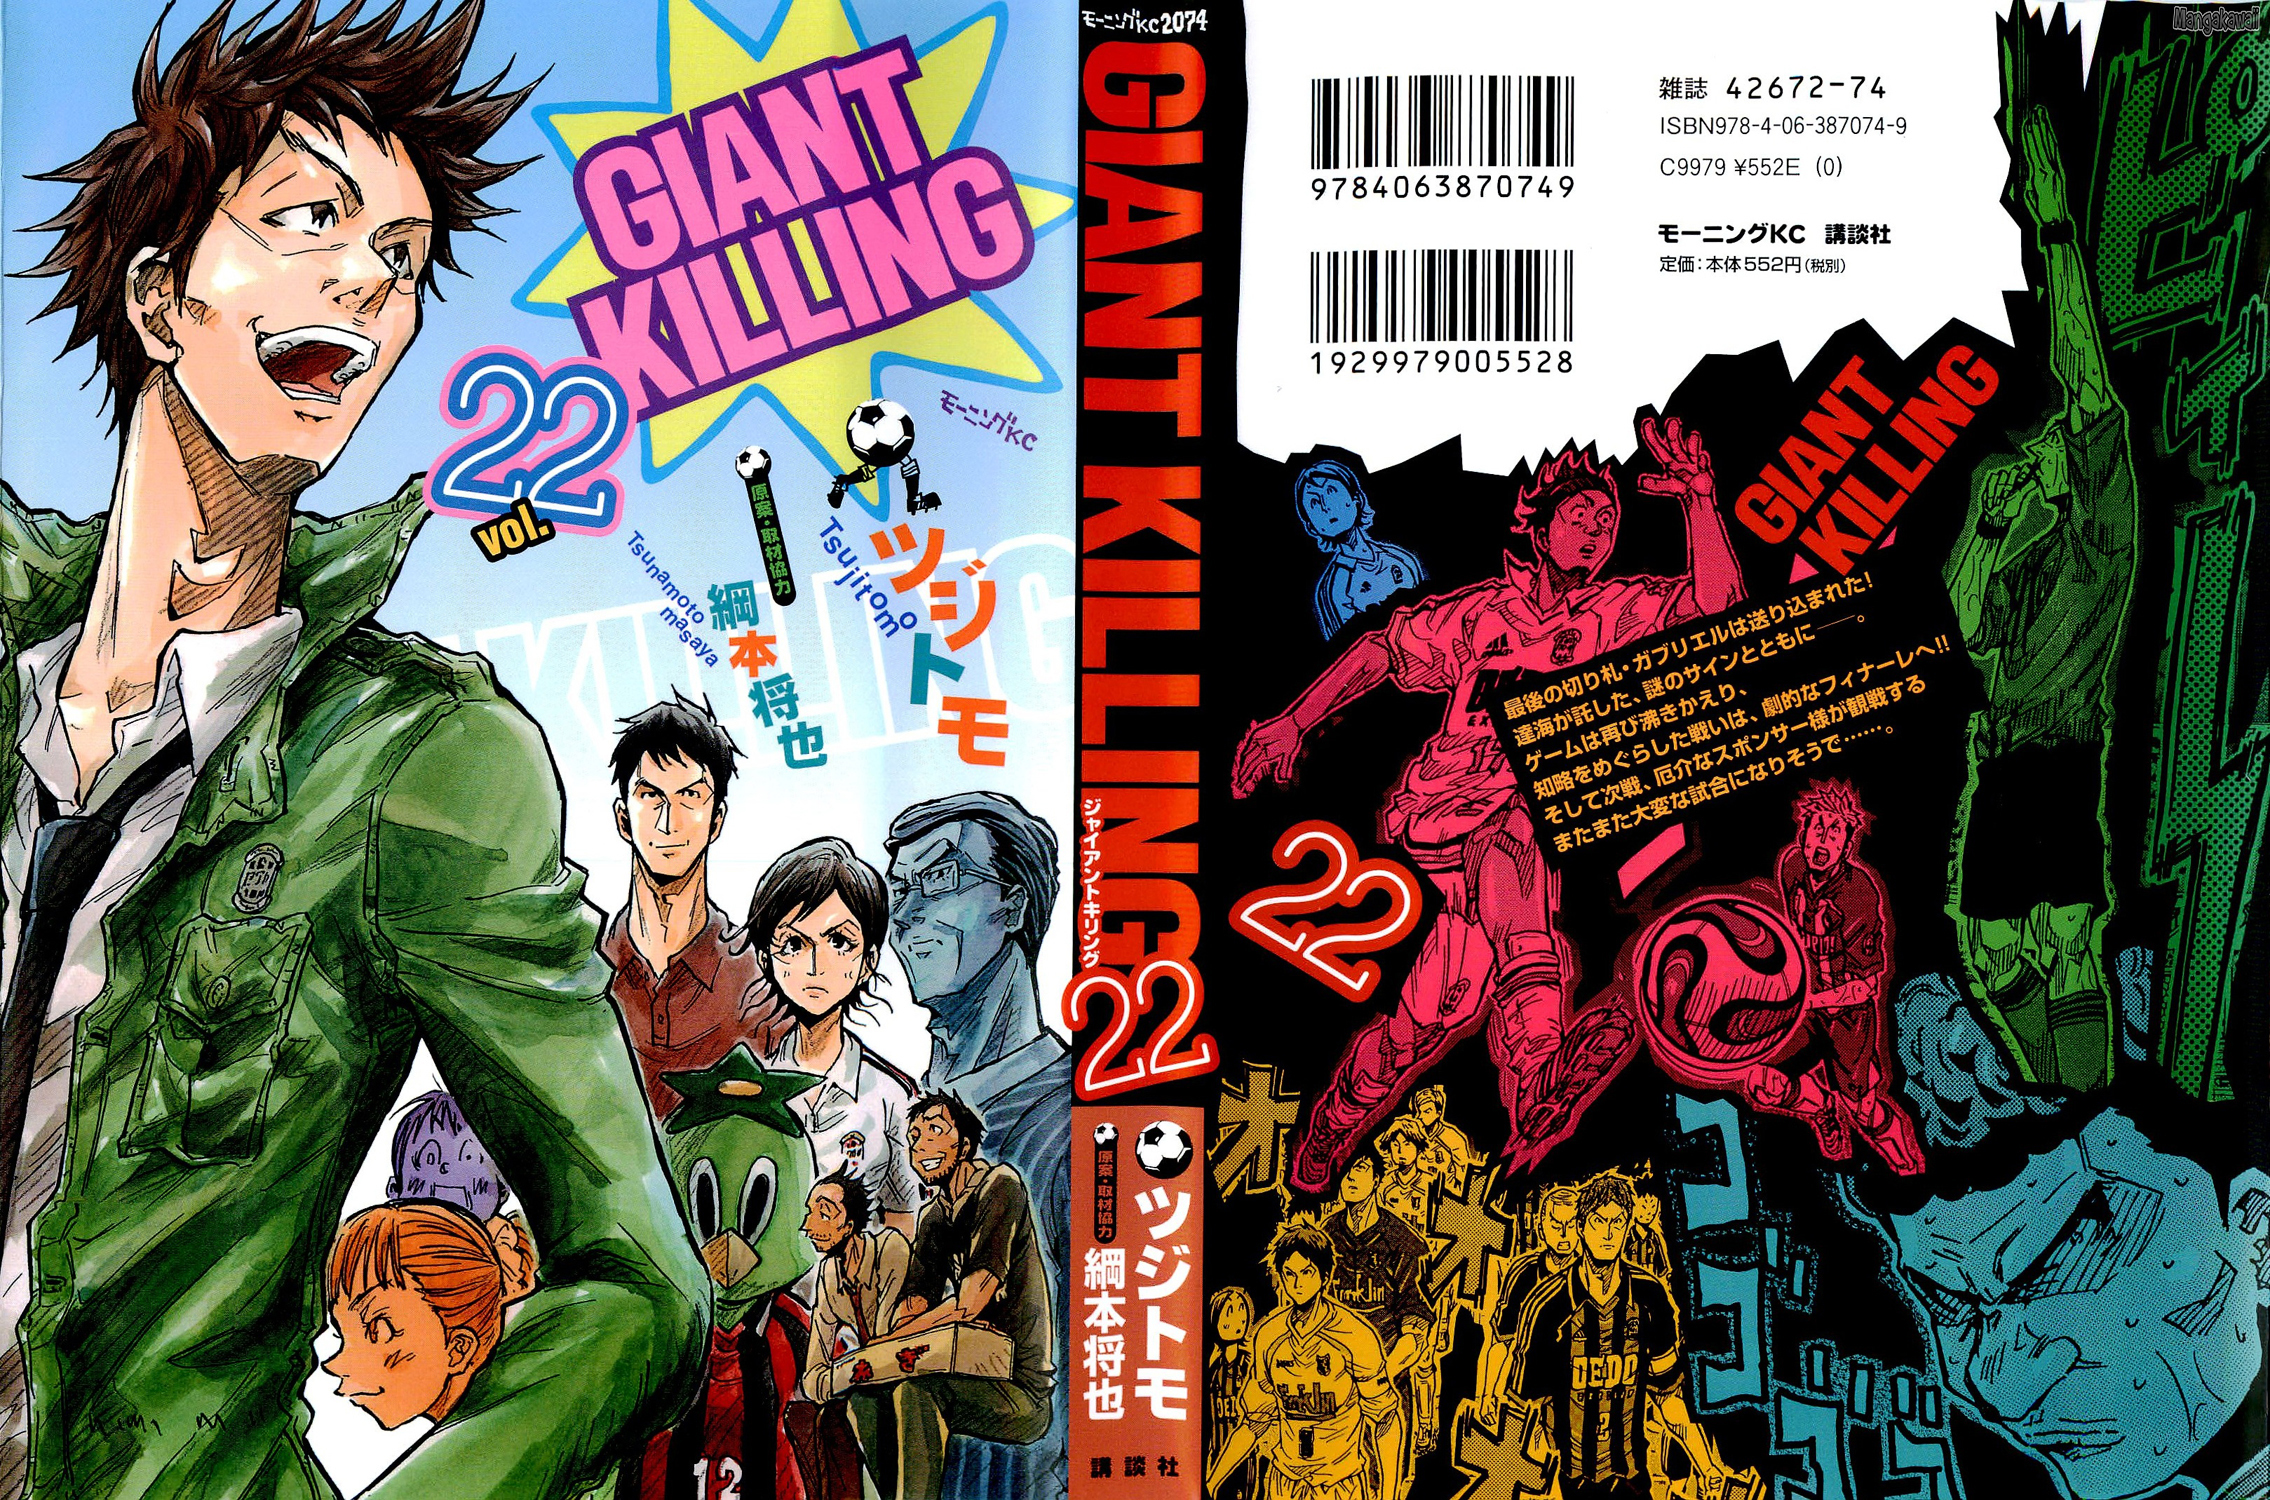 https://nine.mangadogs.com/fr_manga/pic1/55/183/9990/GiantKillingChapitre208_0_567.jpg Page 1